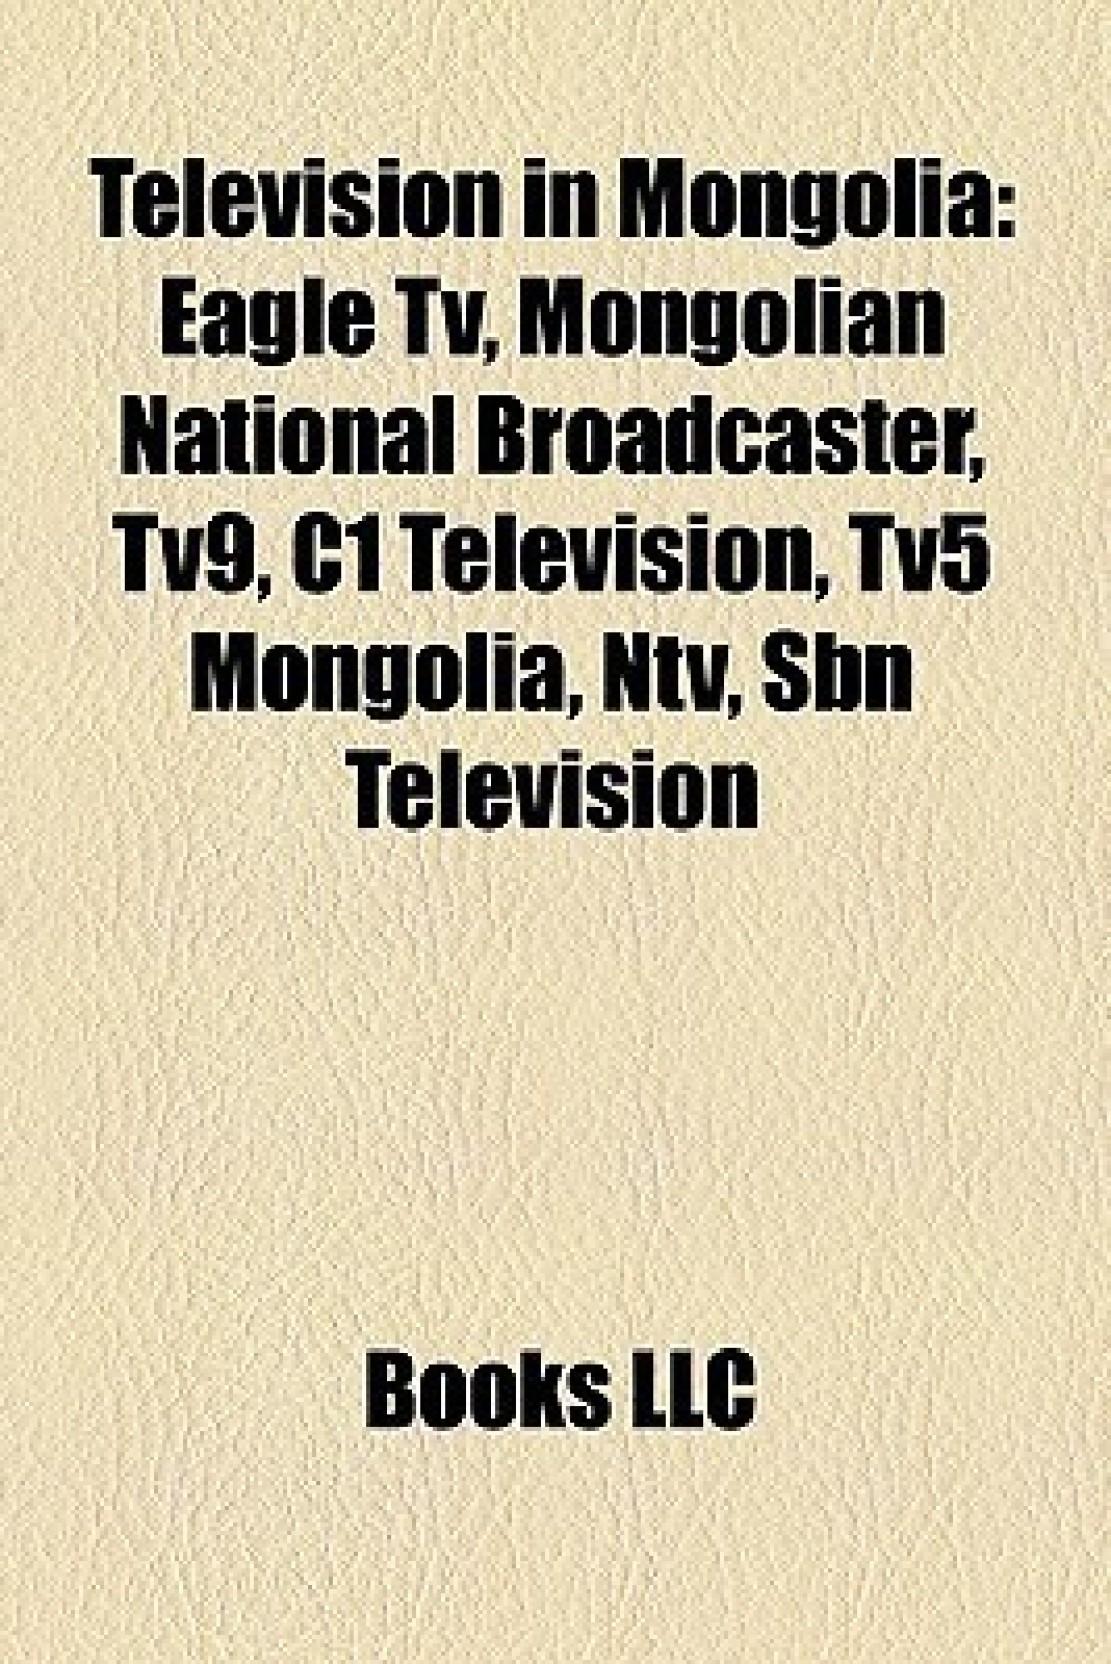 Television in Mongolia: Eagle Tv, Mongolian National